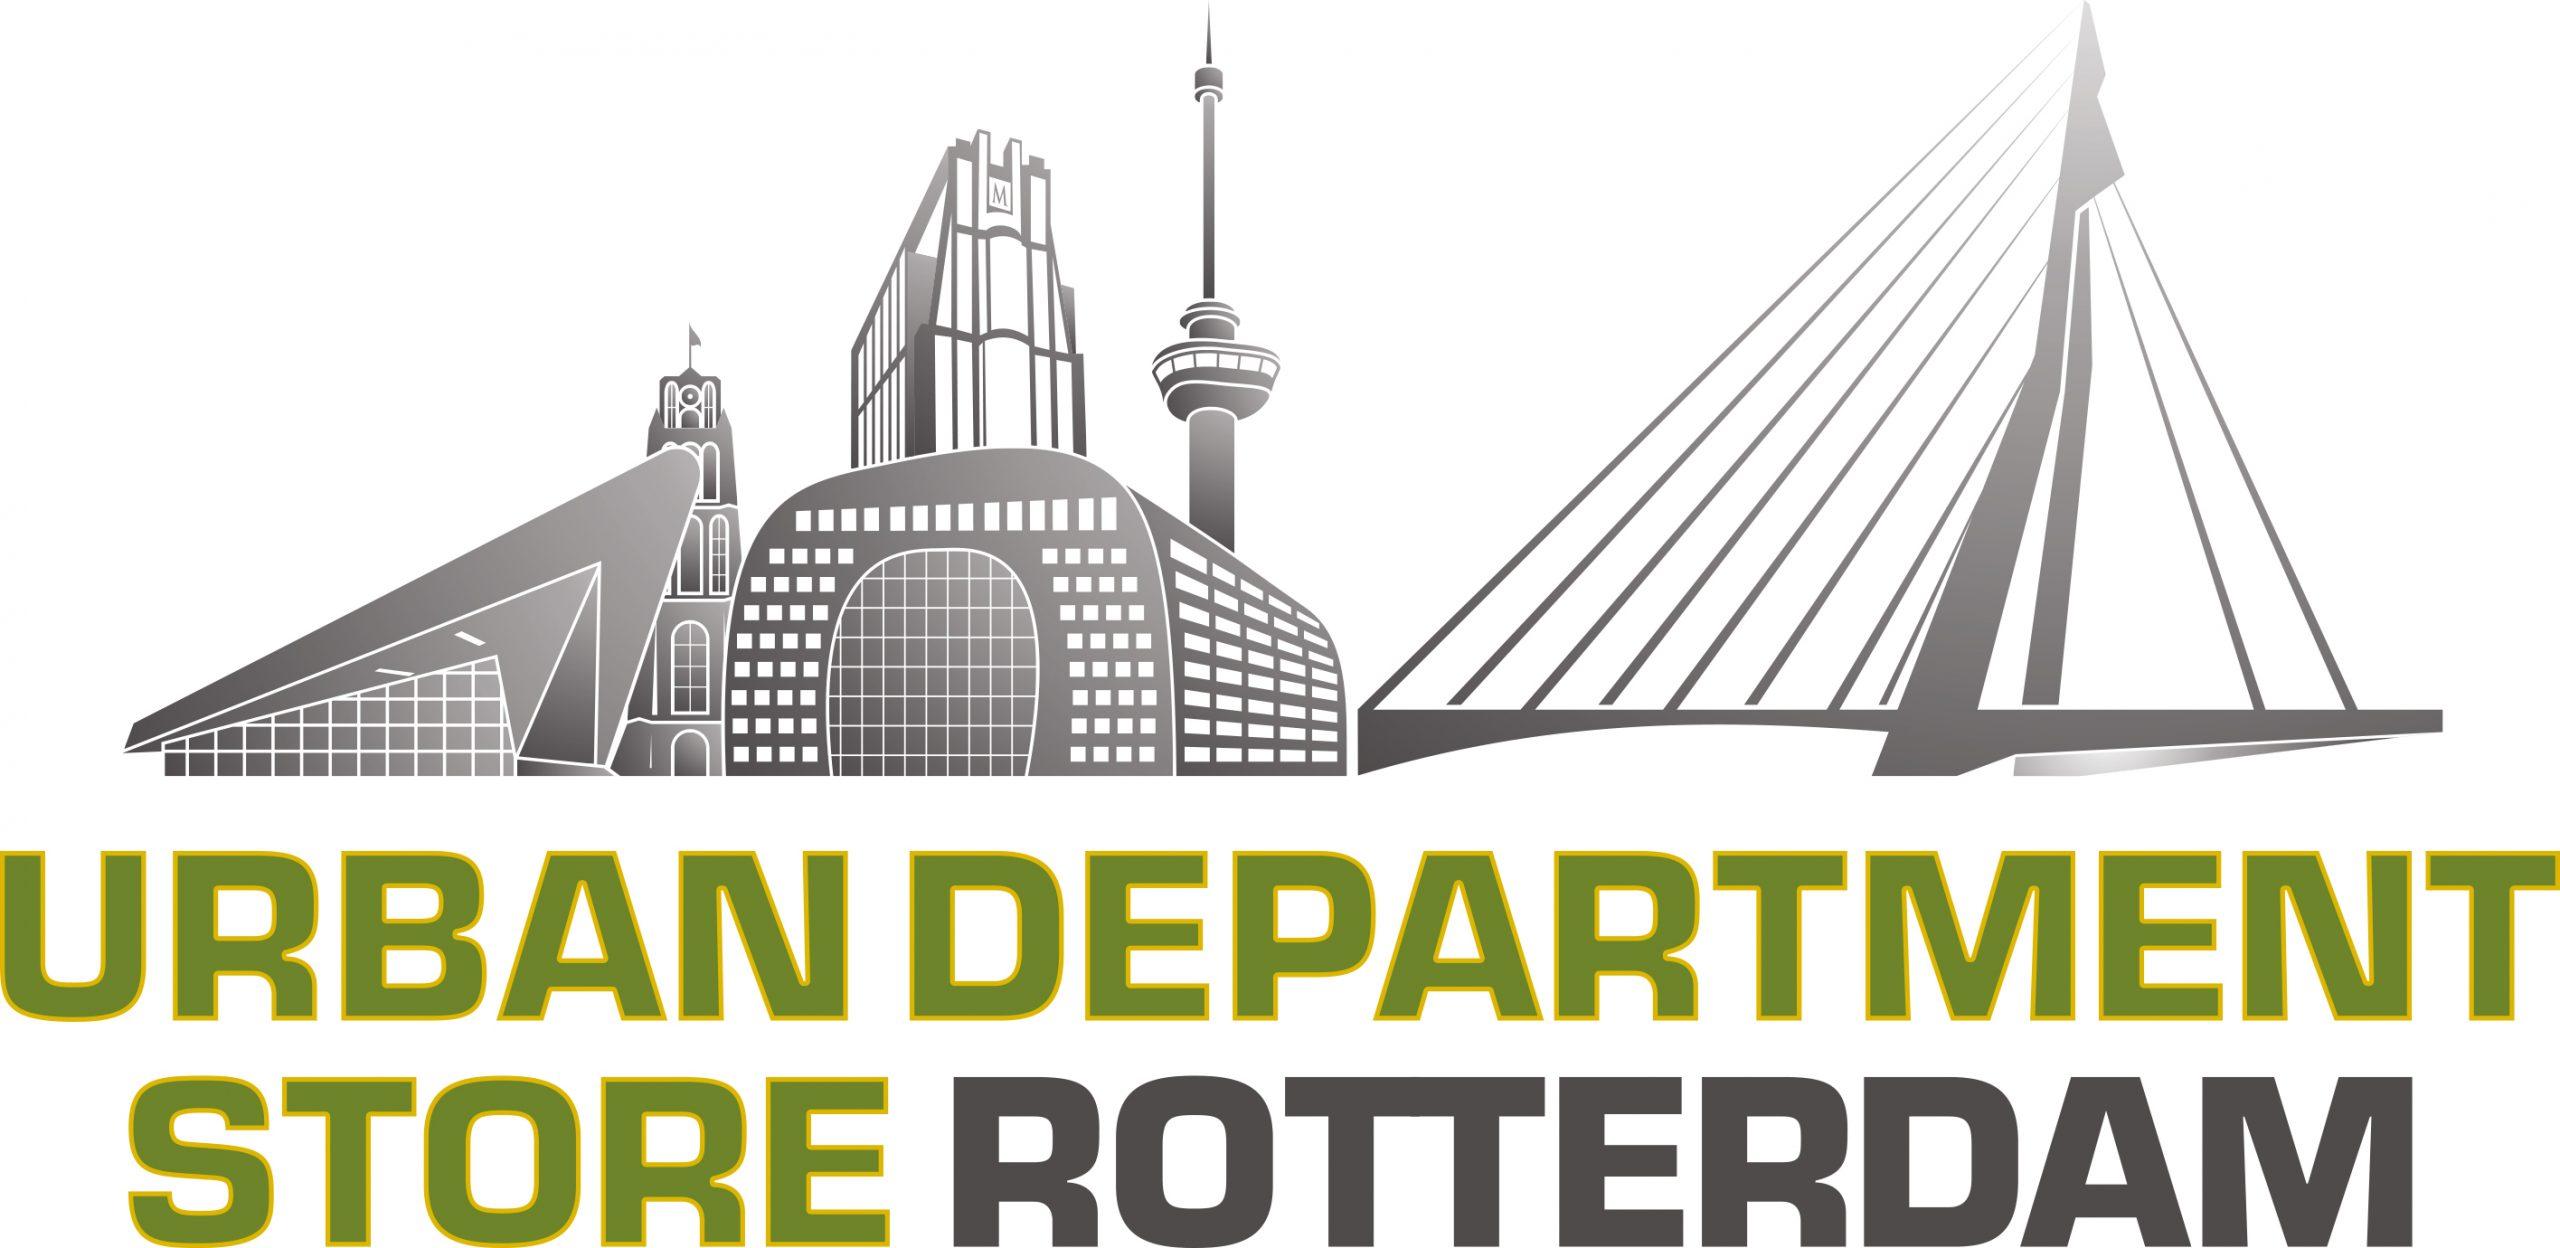 Urban Department Store Rotterdam